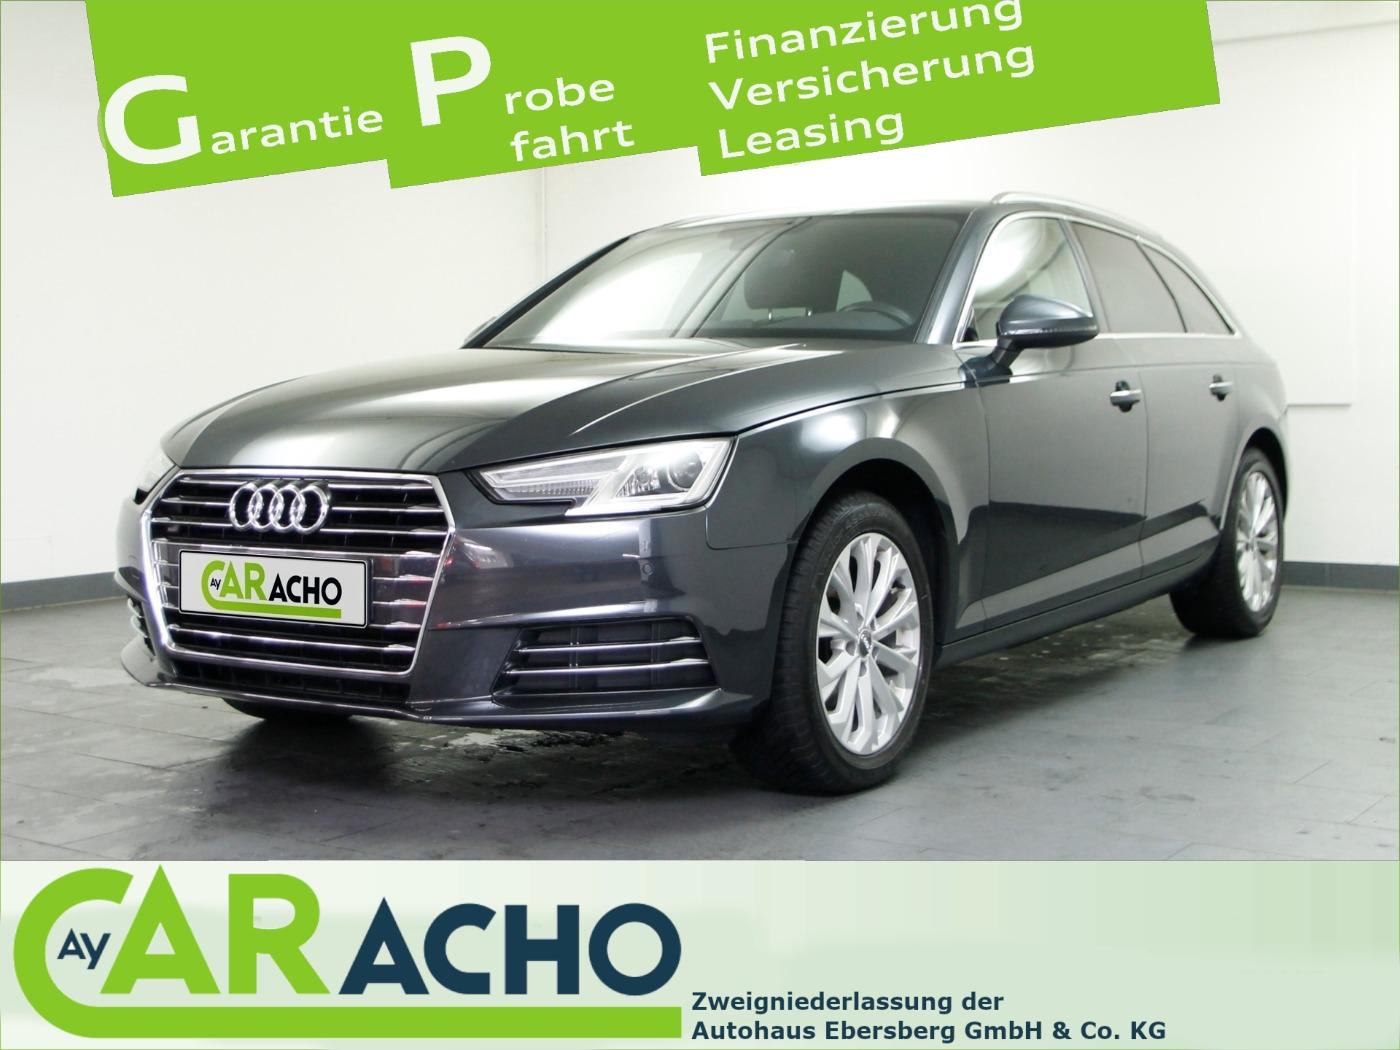 Audi A4 Avant design 1.4 TFSI AHK-VB Navi PDC LM17, Jahr 2016, Benzin